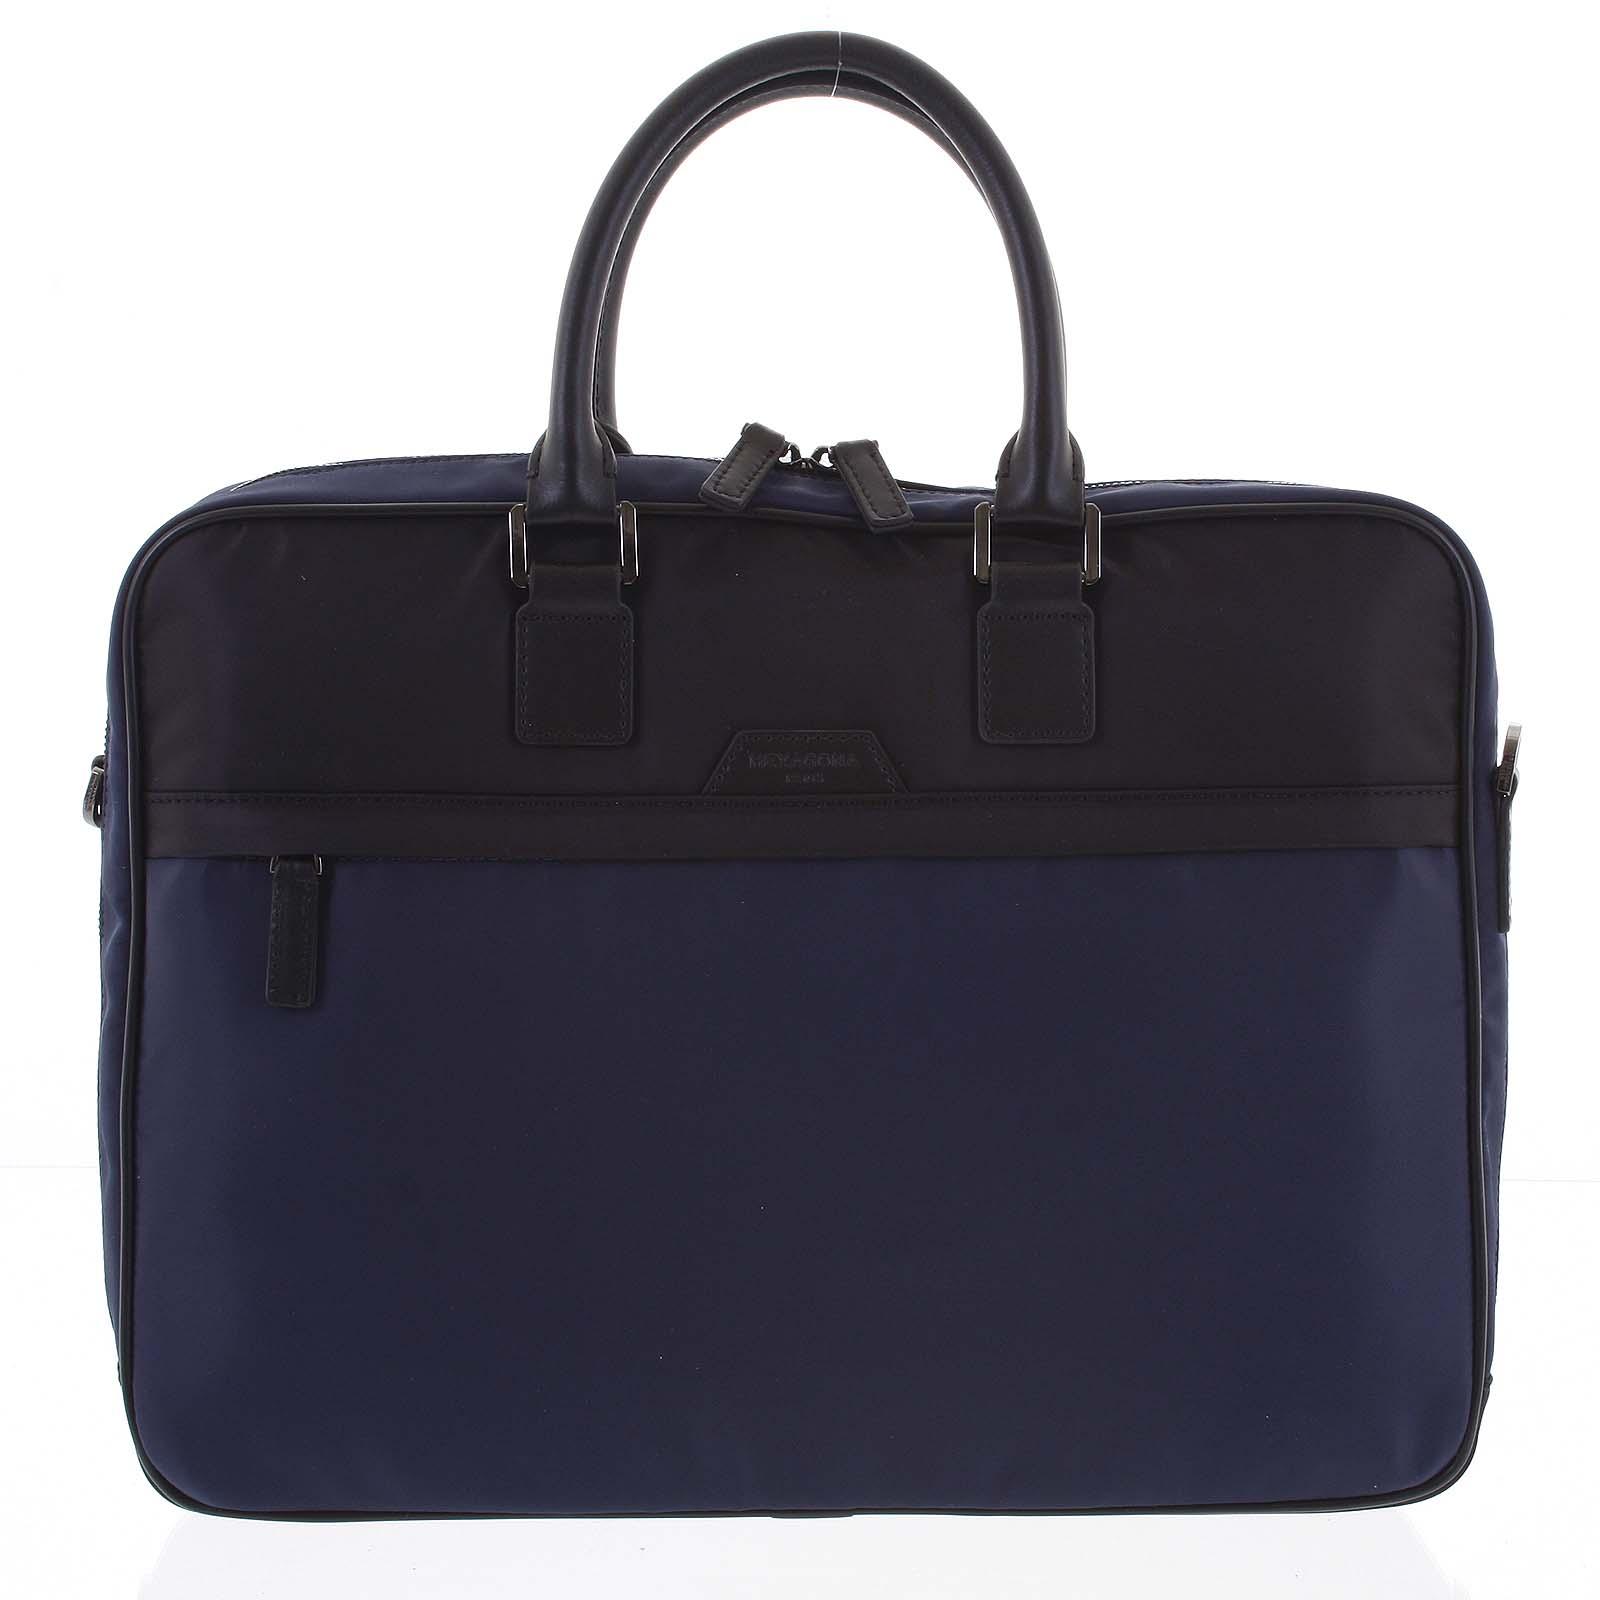 Pánská taška na notebook modro černá - Hexagona Aslan modrá